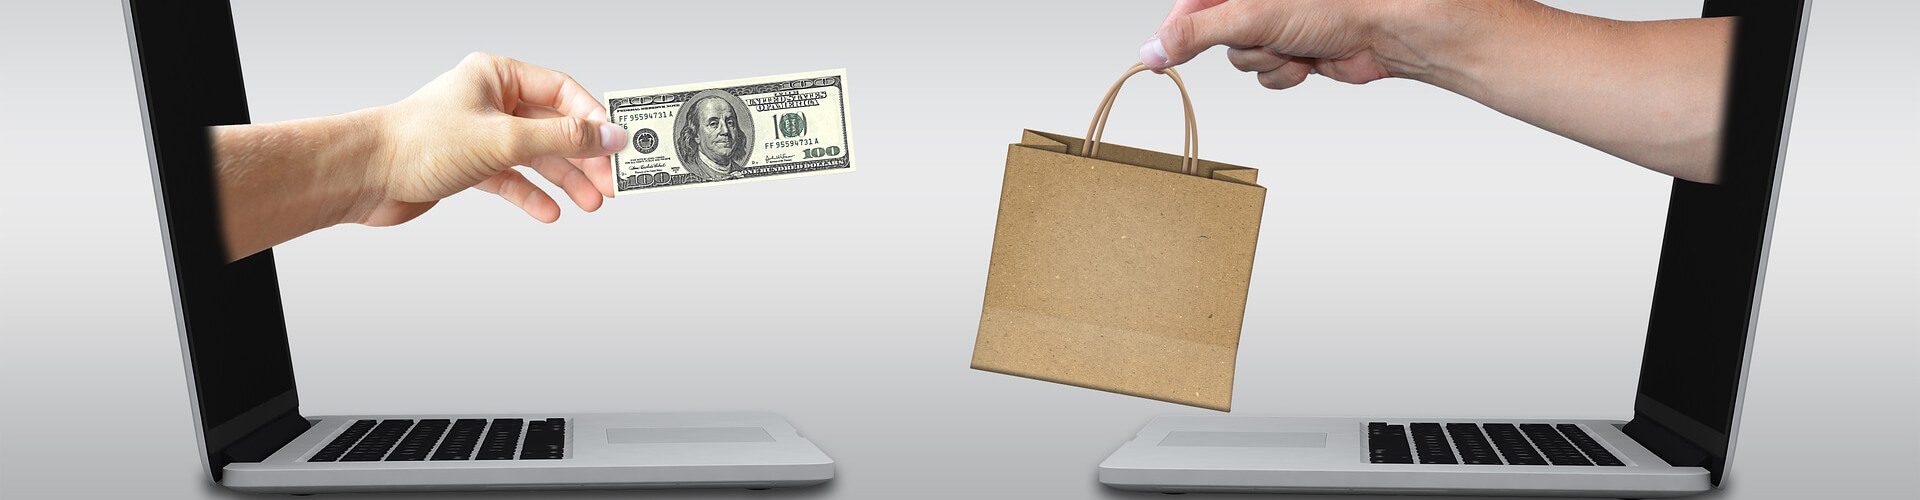 ecommerce online sales